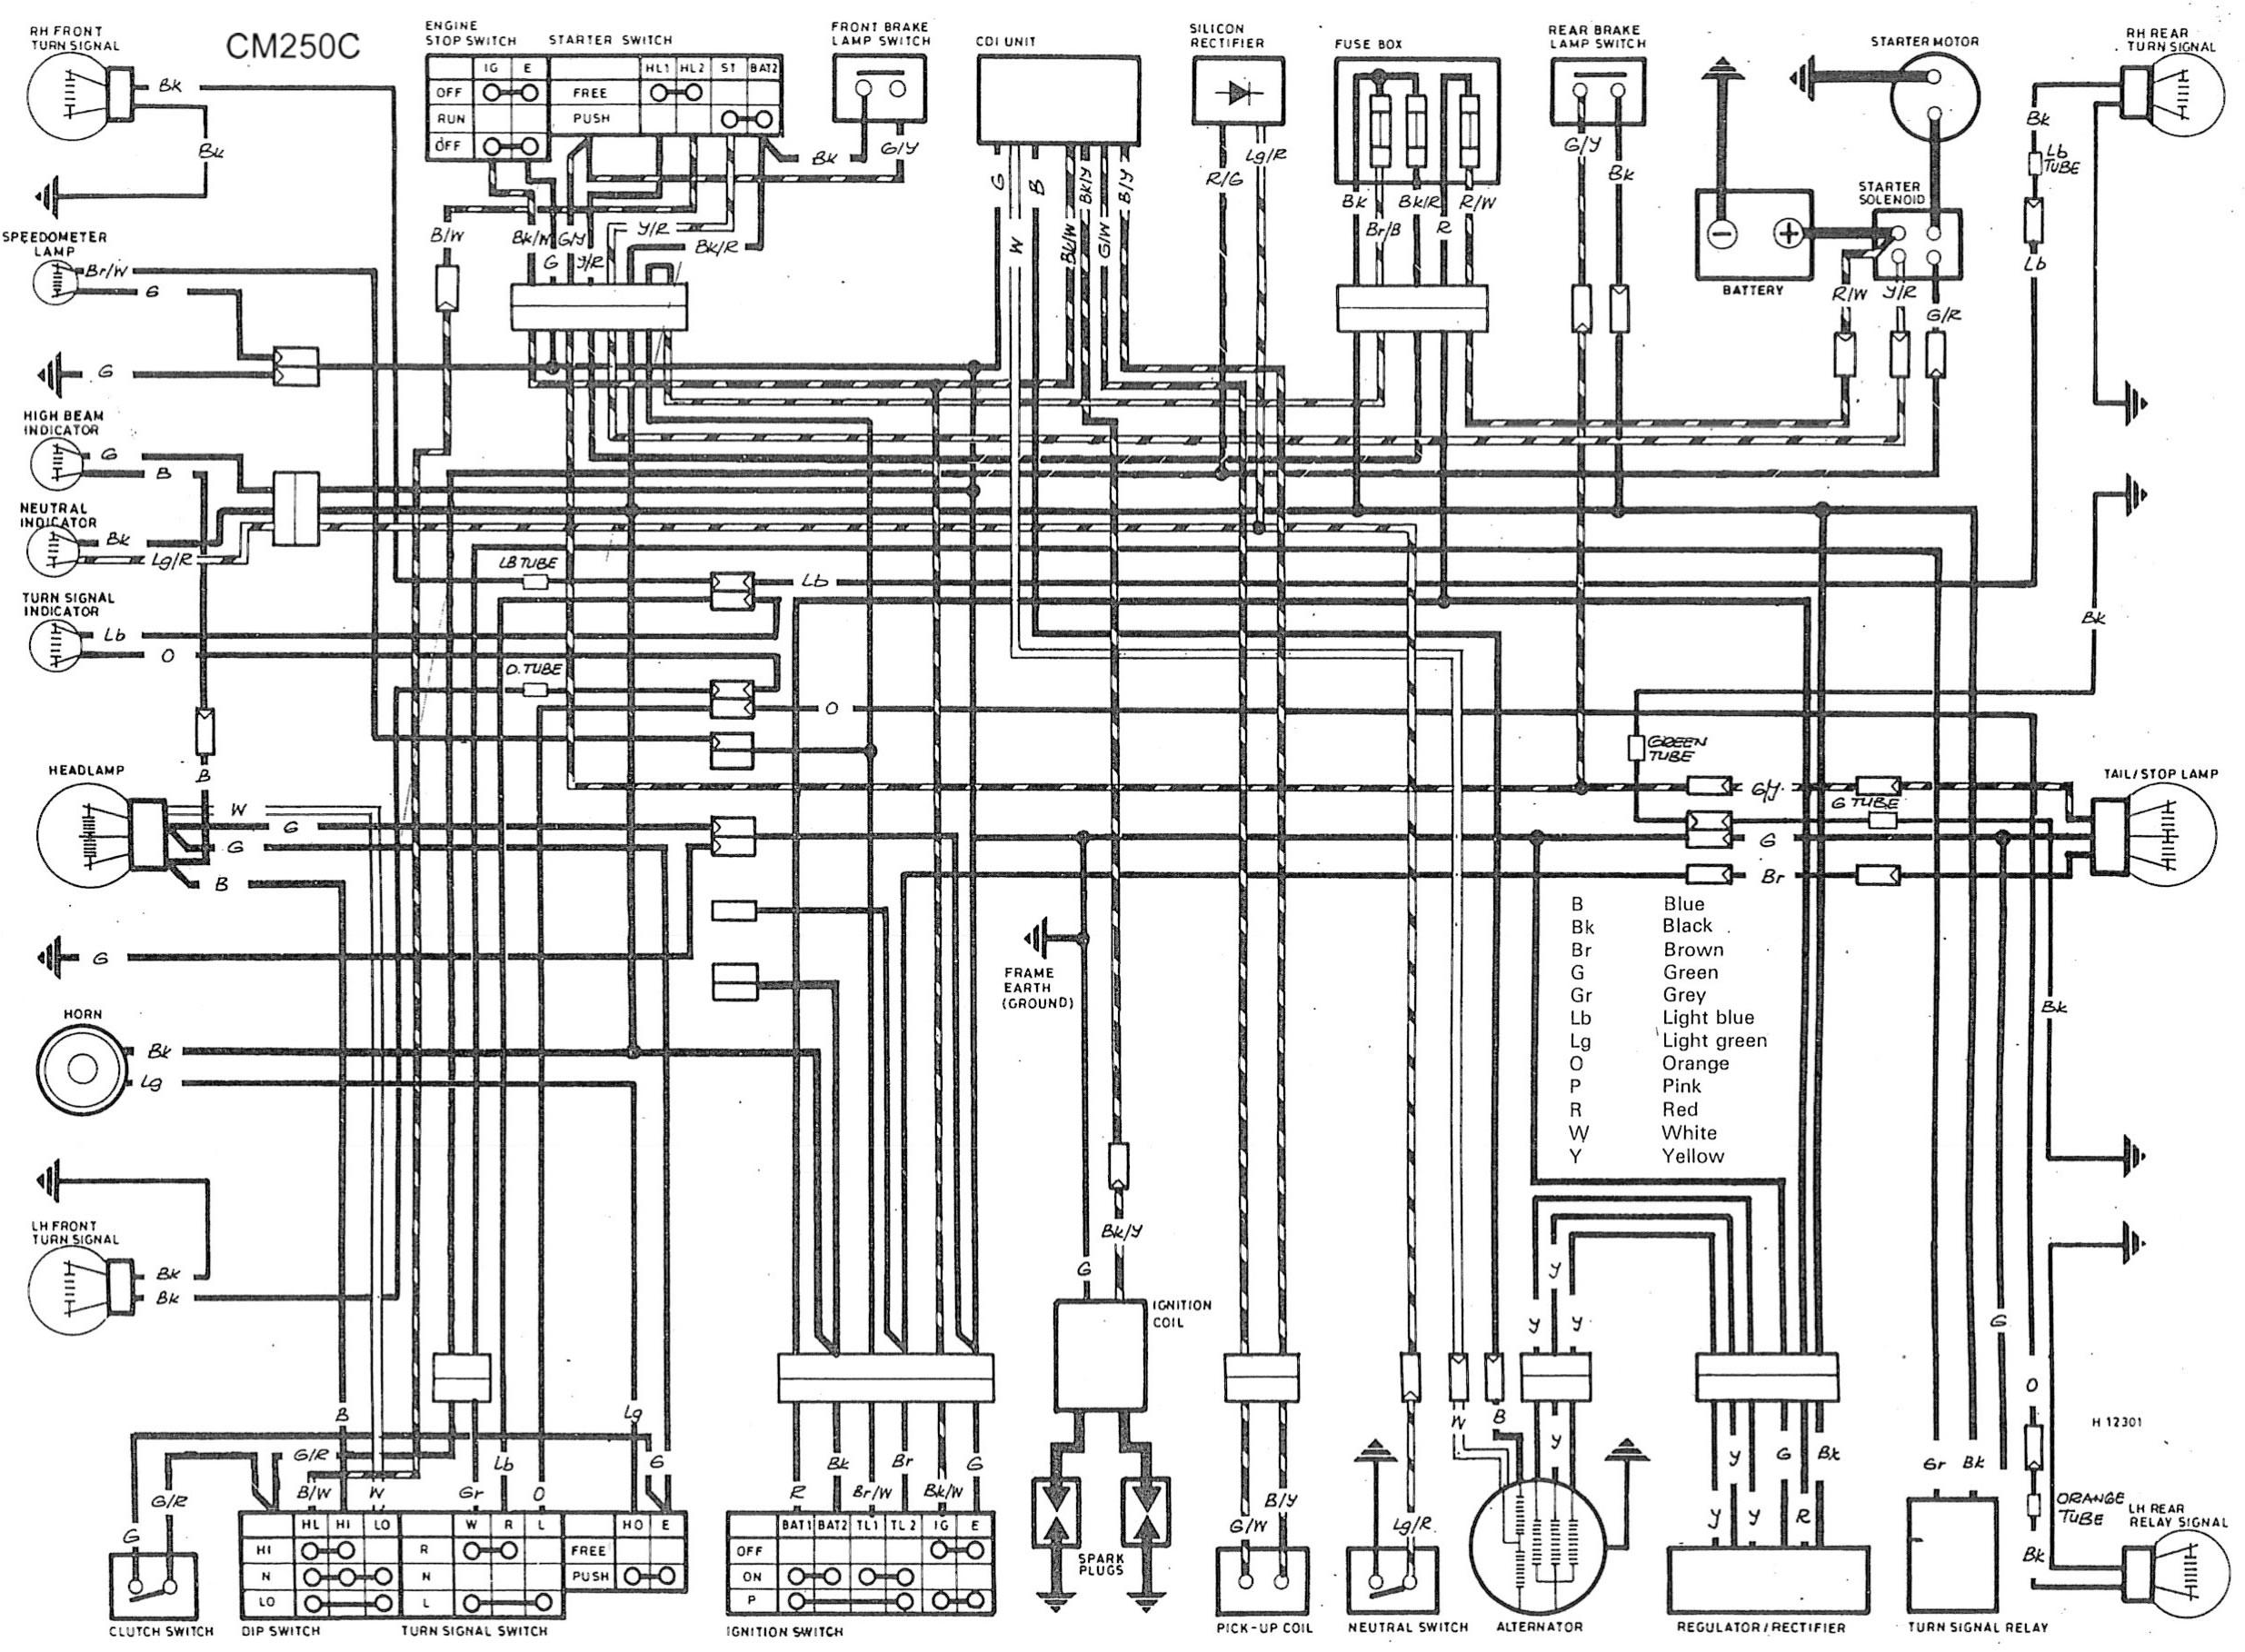 suzuki gs550e wiring diagram 2004 chrysler pacifica exhaust system 1980 gs550 somurich